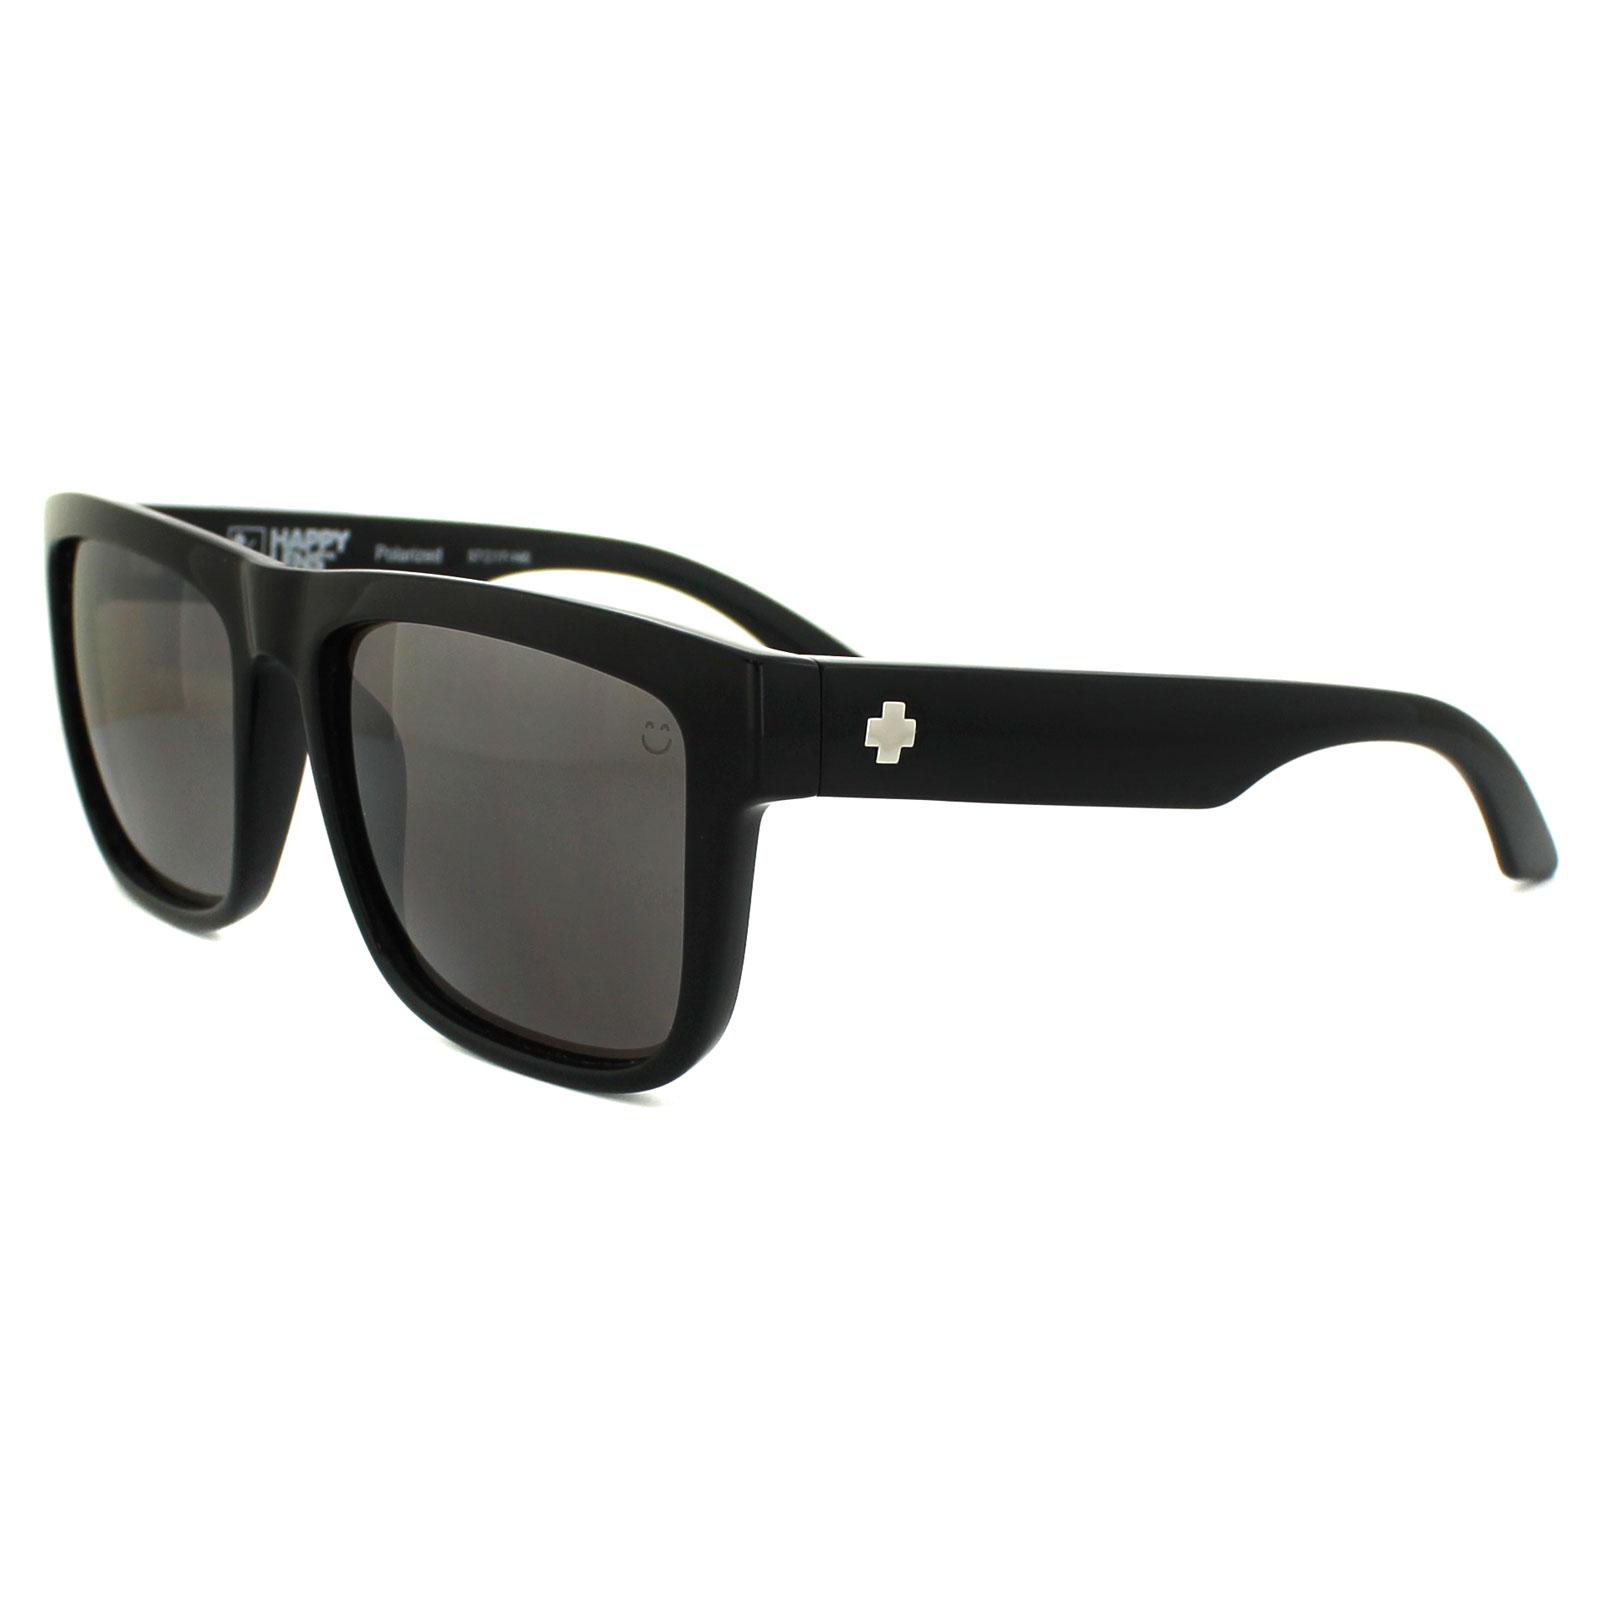 0bef5712ca Cheap Spy Discord Sunglasses « Heritage Malta